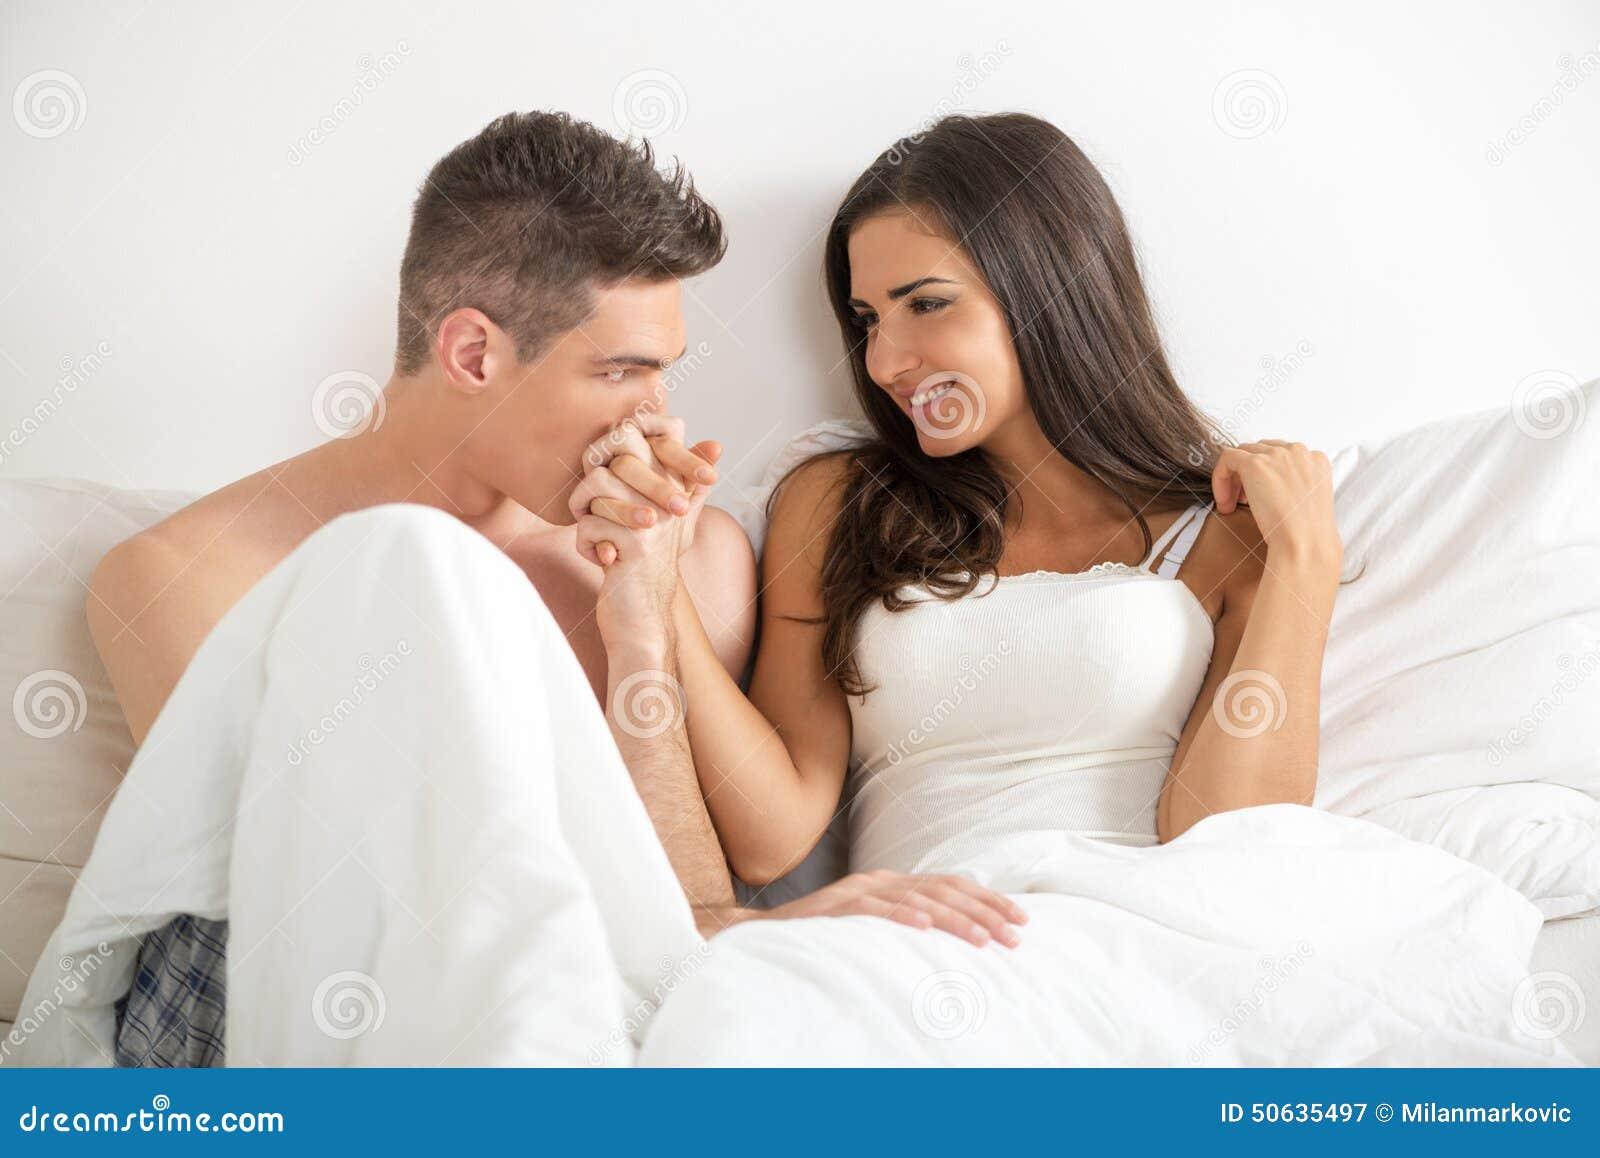 online dating vs normal dating